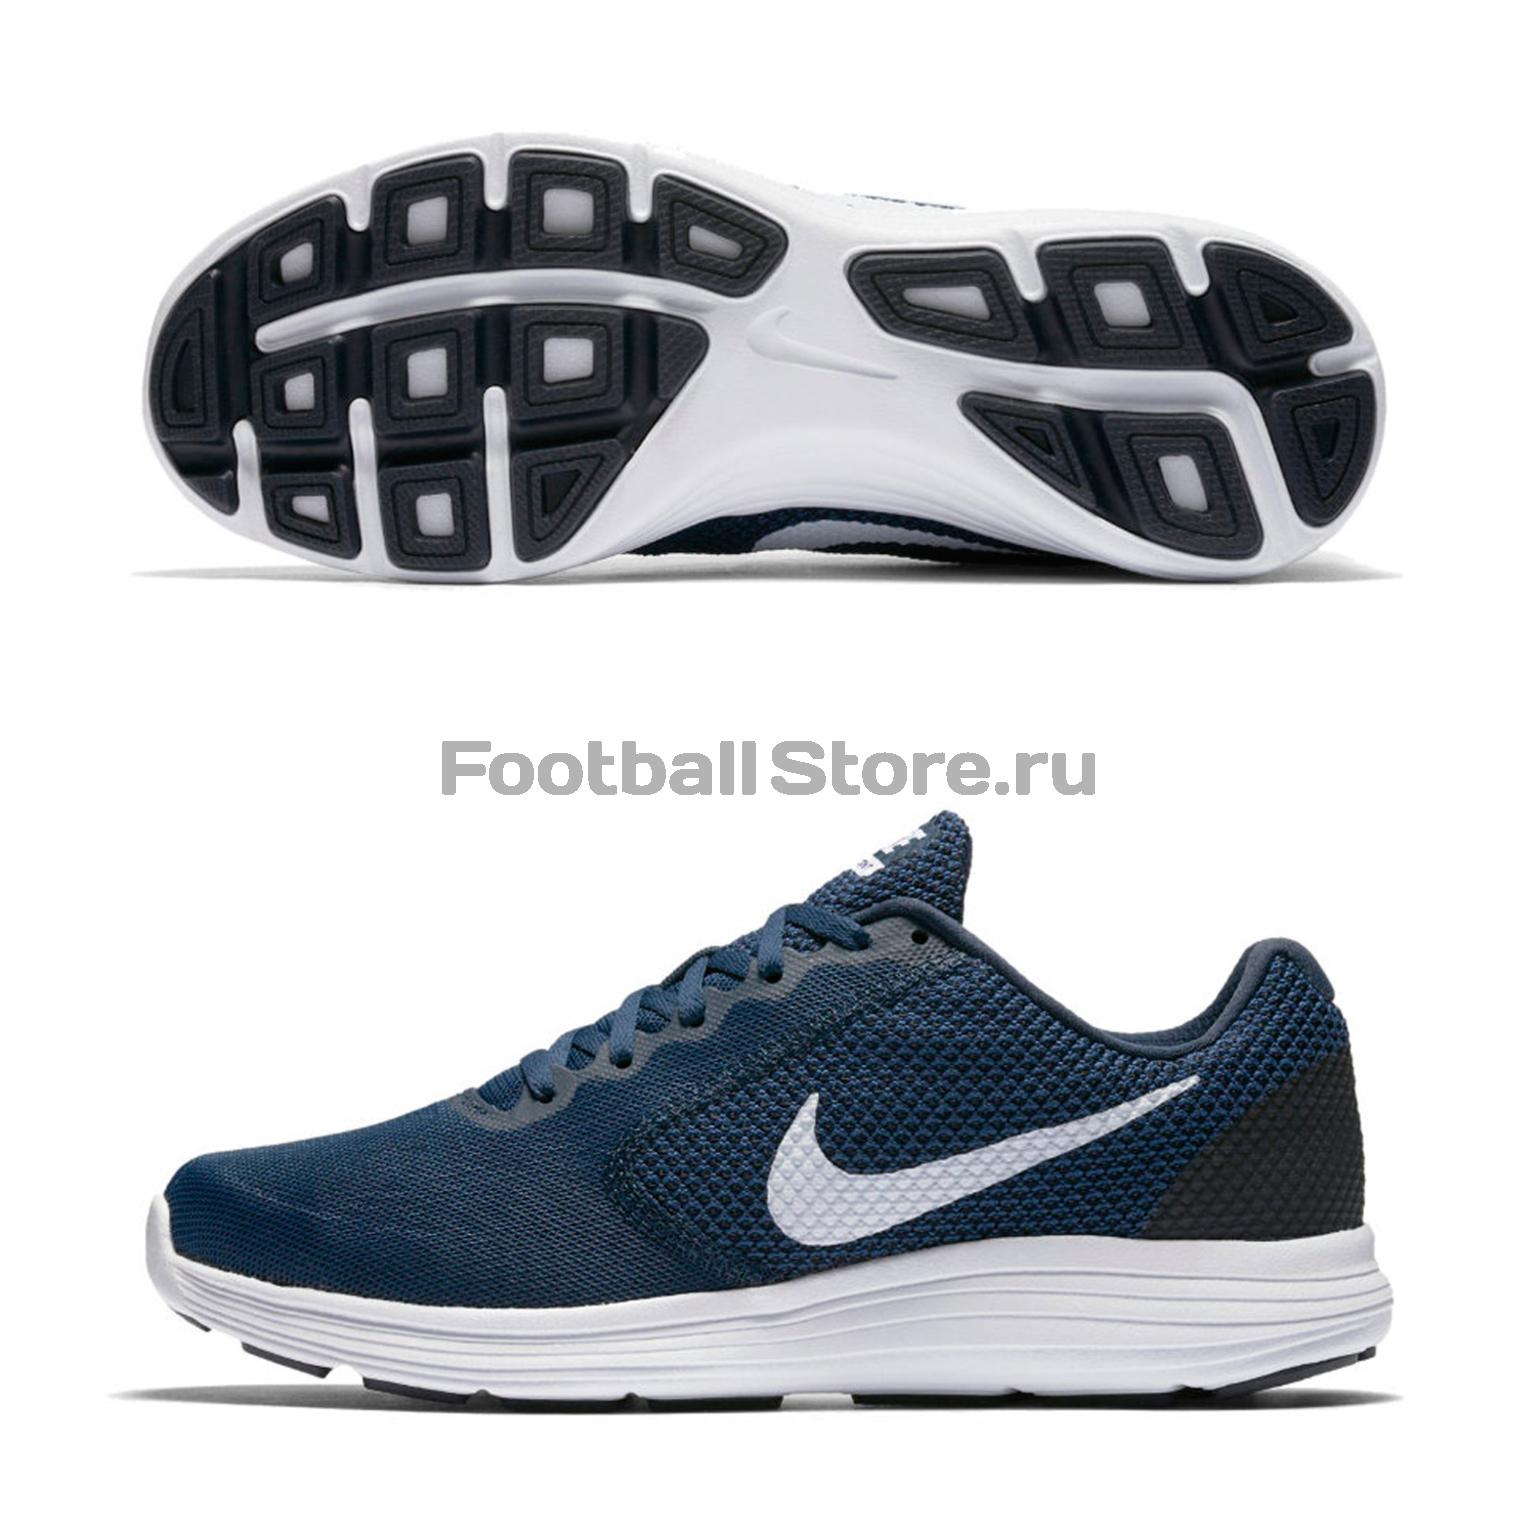 Кроссовки Nike Кроссовки Nike Revolution 3 819300-406 кроссовки nike кроссовки nike md runner 2 749794 410